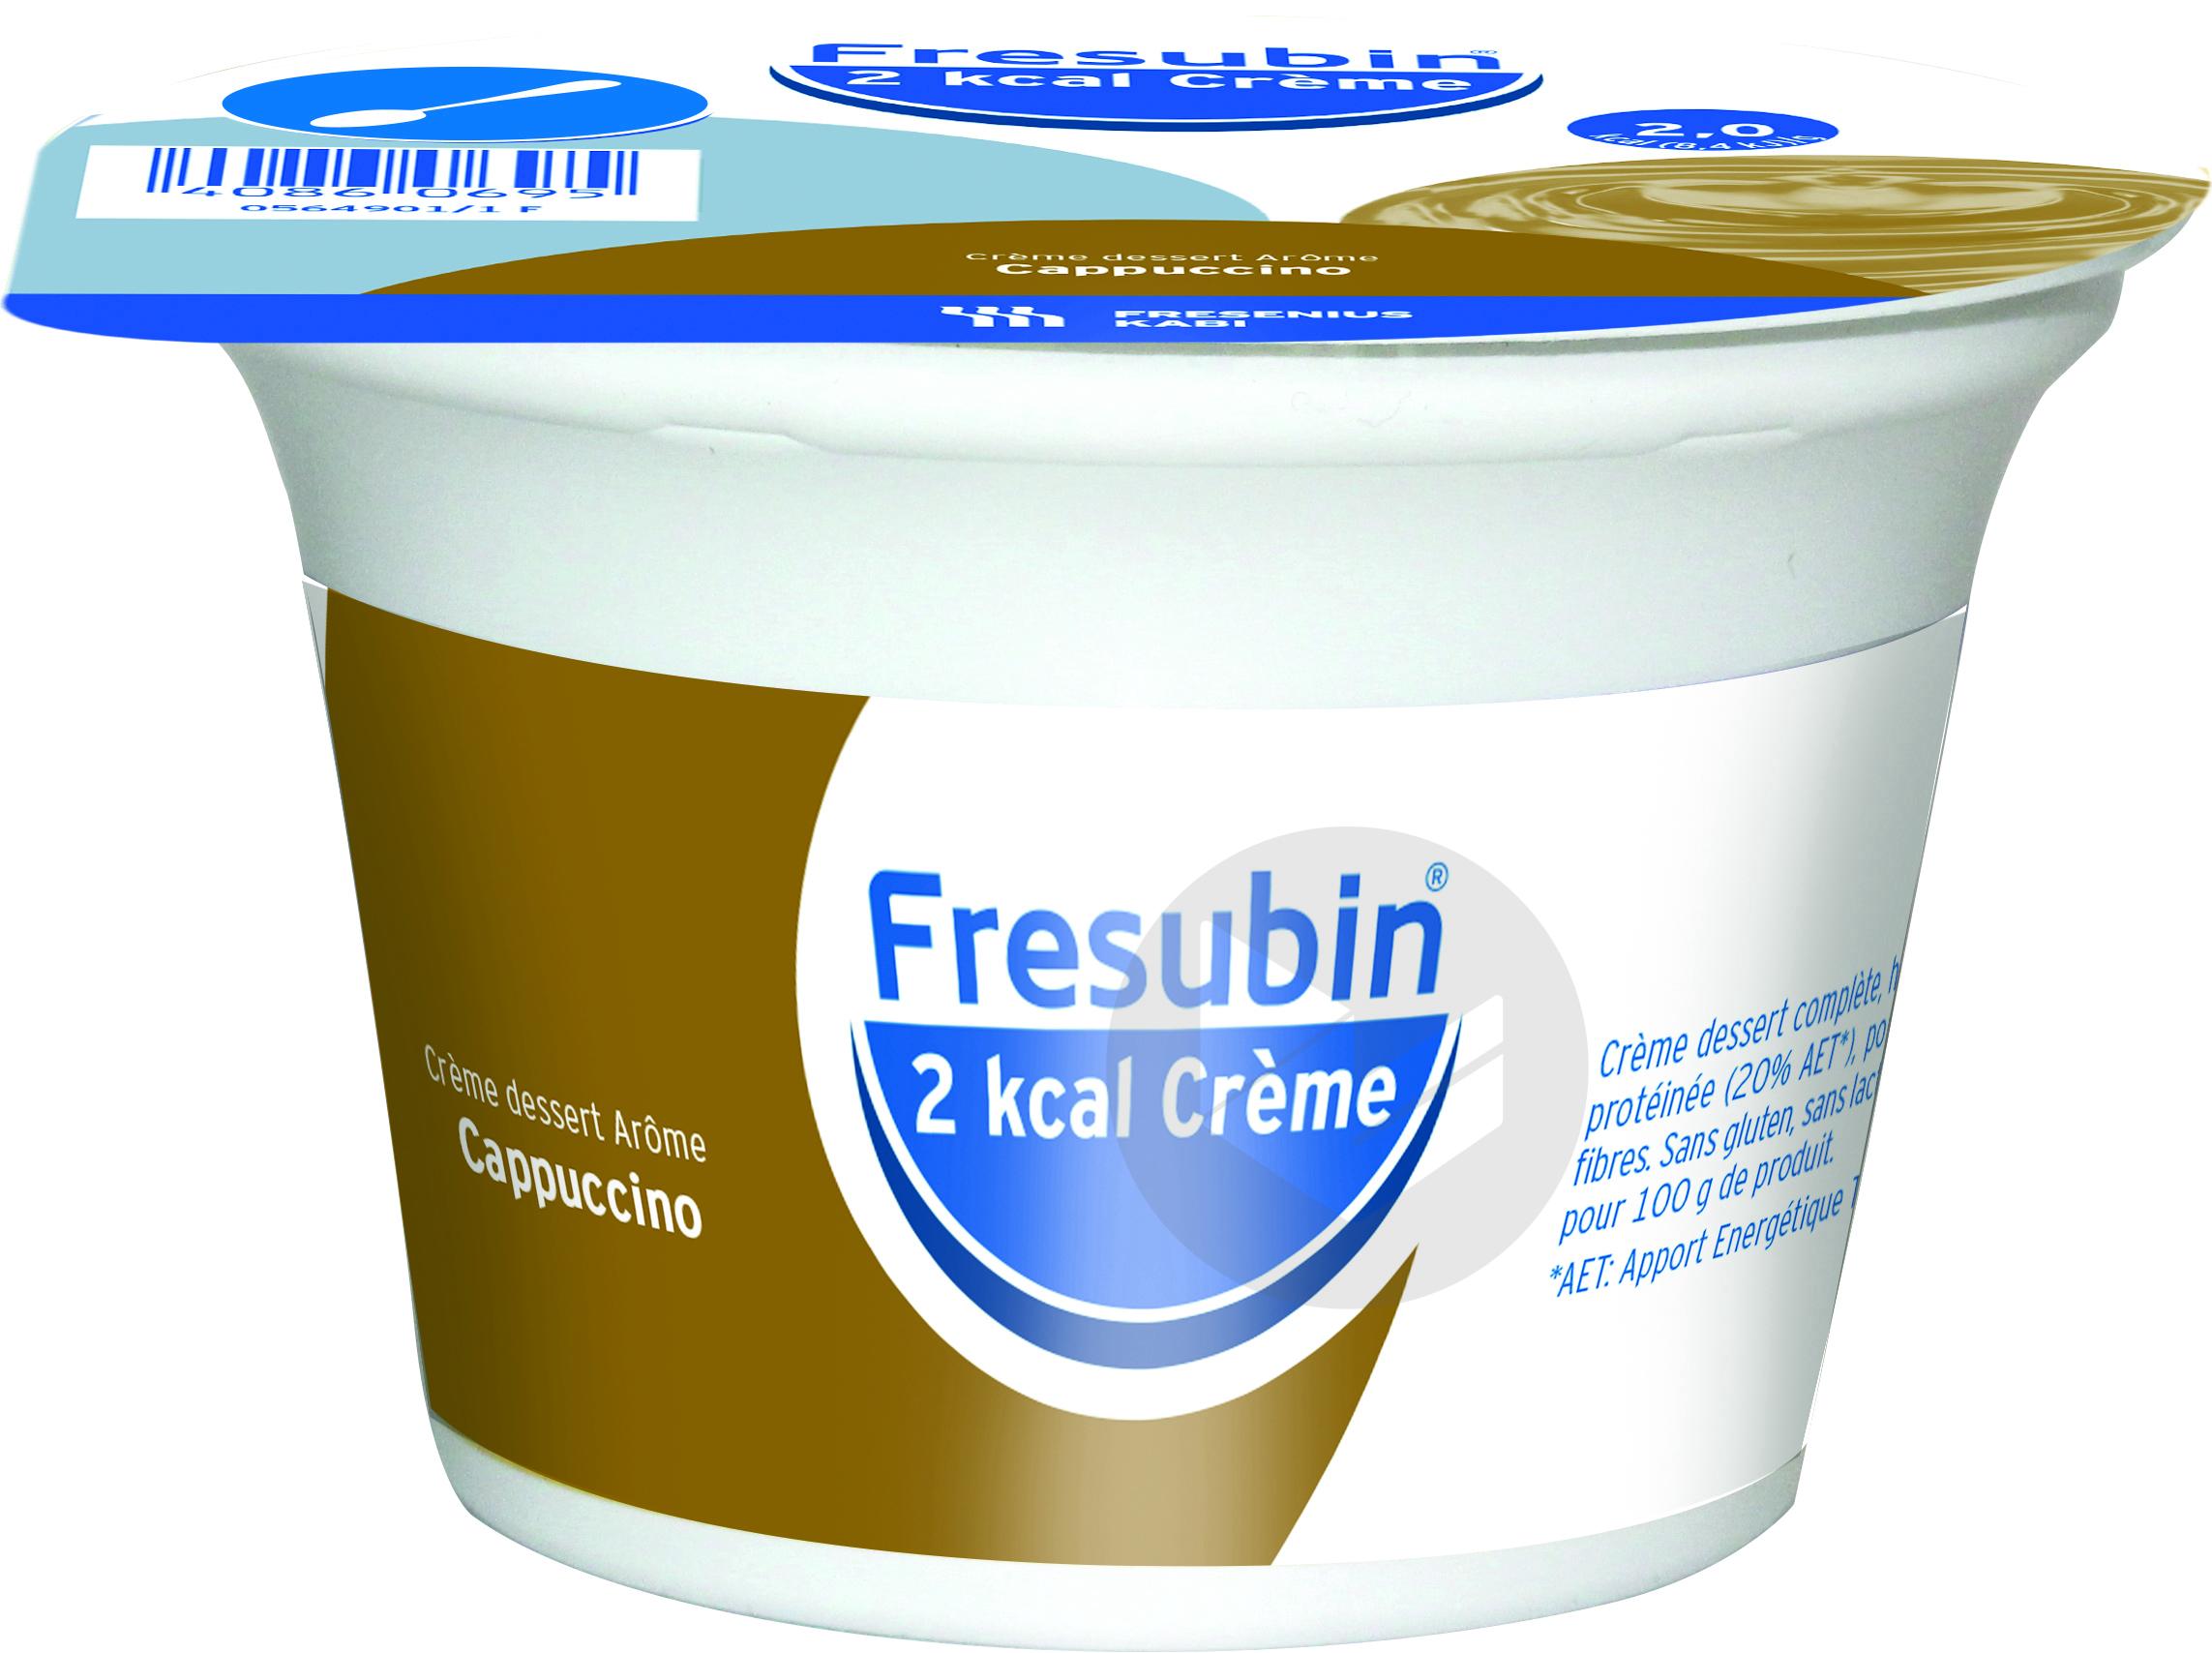 Fresubin 2 Kcal Creme Sans Lactose Nutriment Cappuccino 4 Pots 200 G